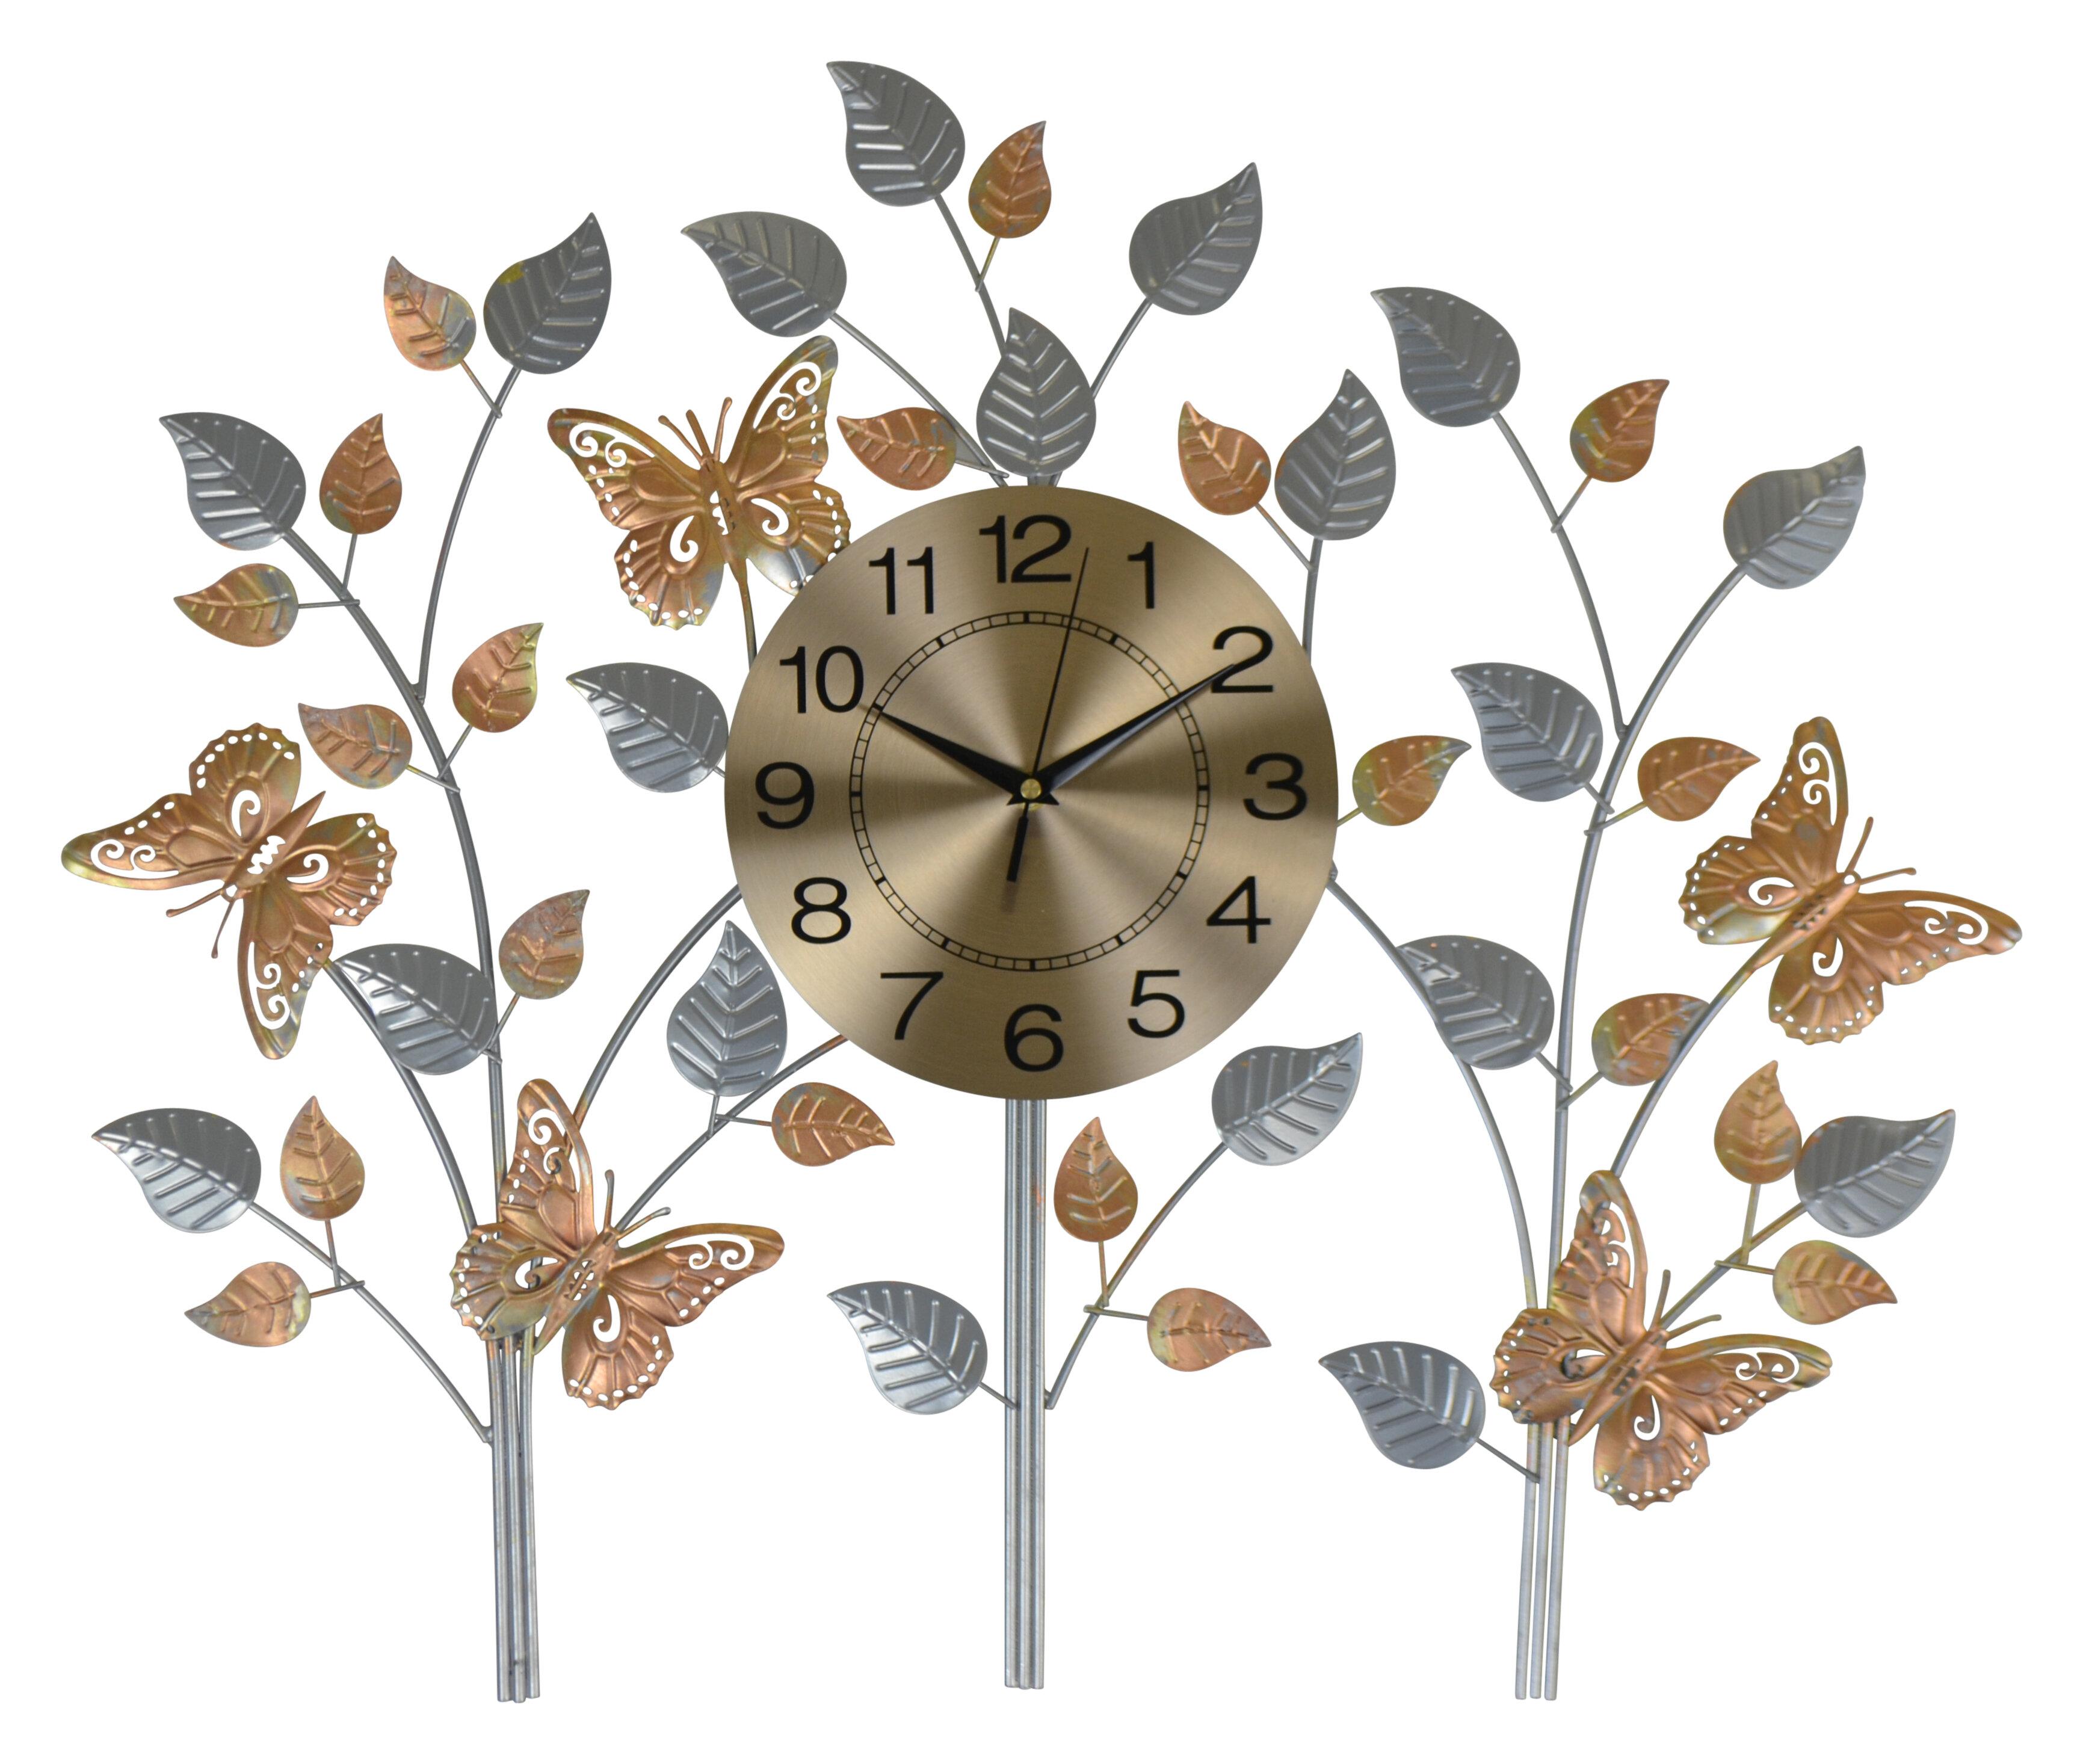 Animal Modern Contemporary Wall Clocks You Ll Love In 2021 Wayfair